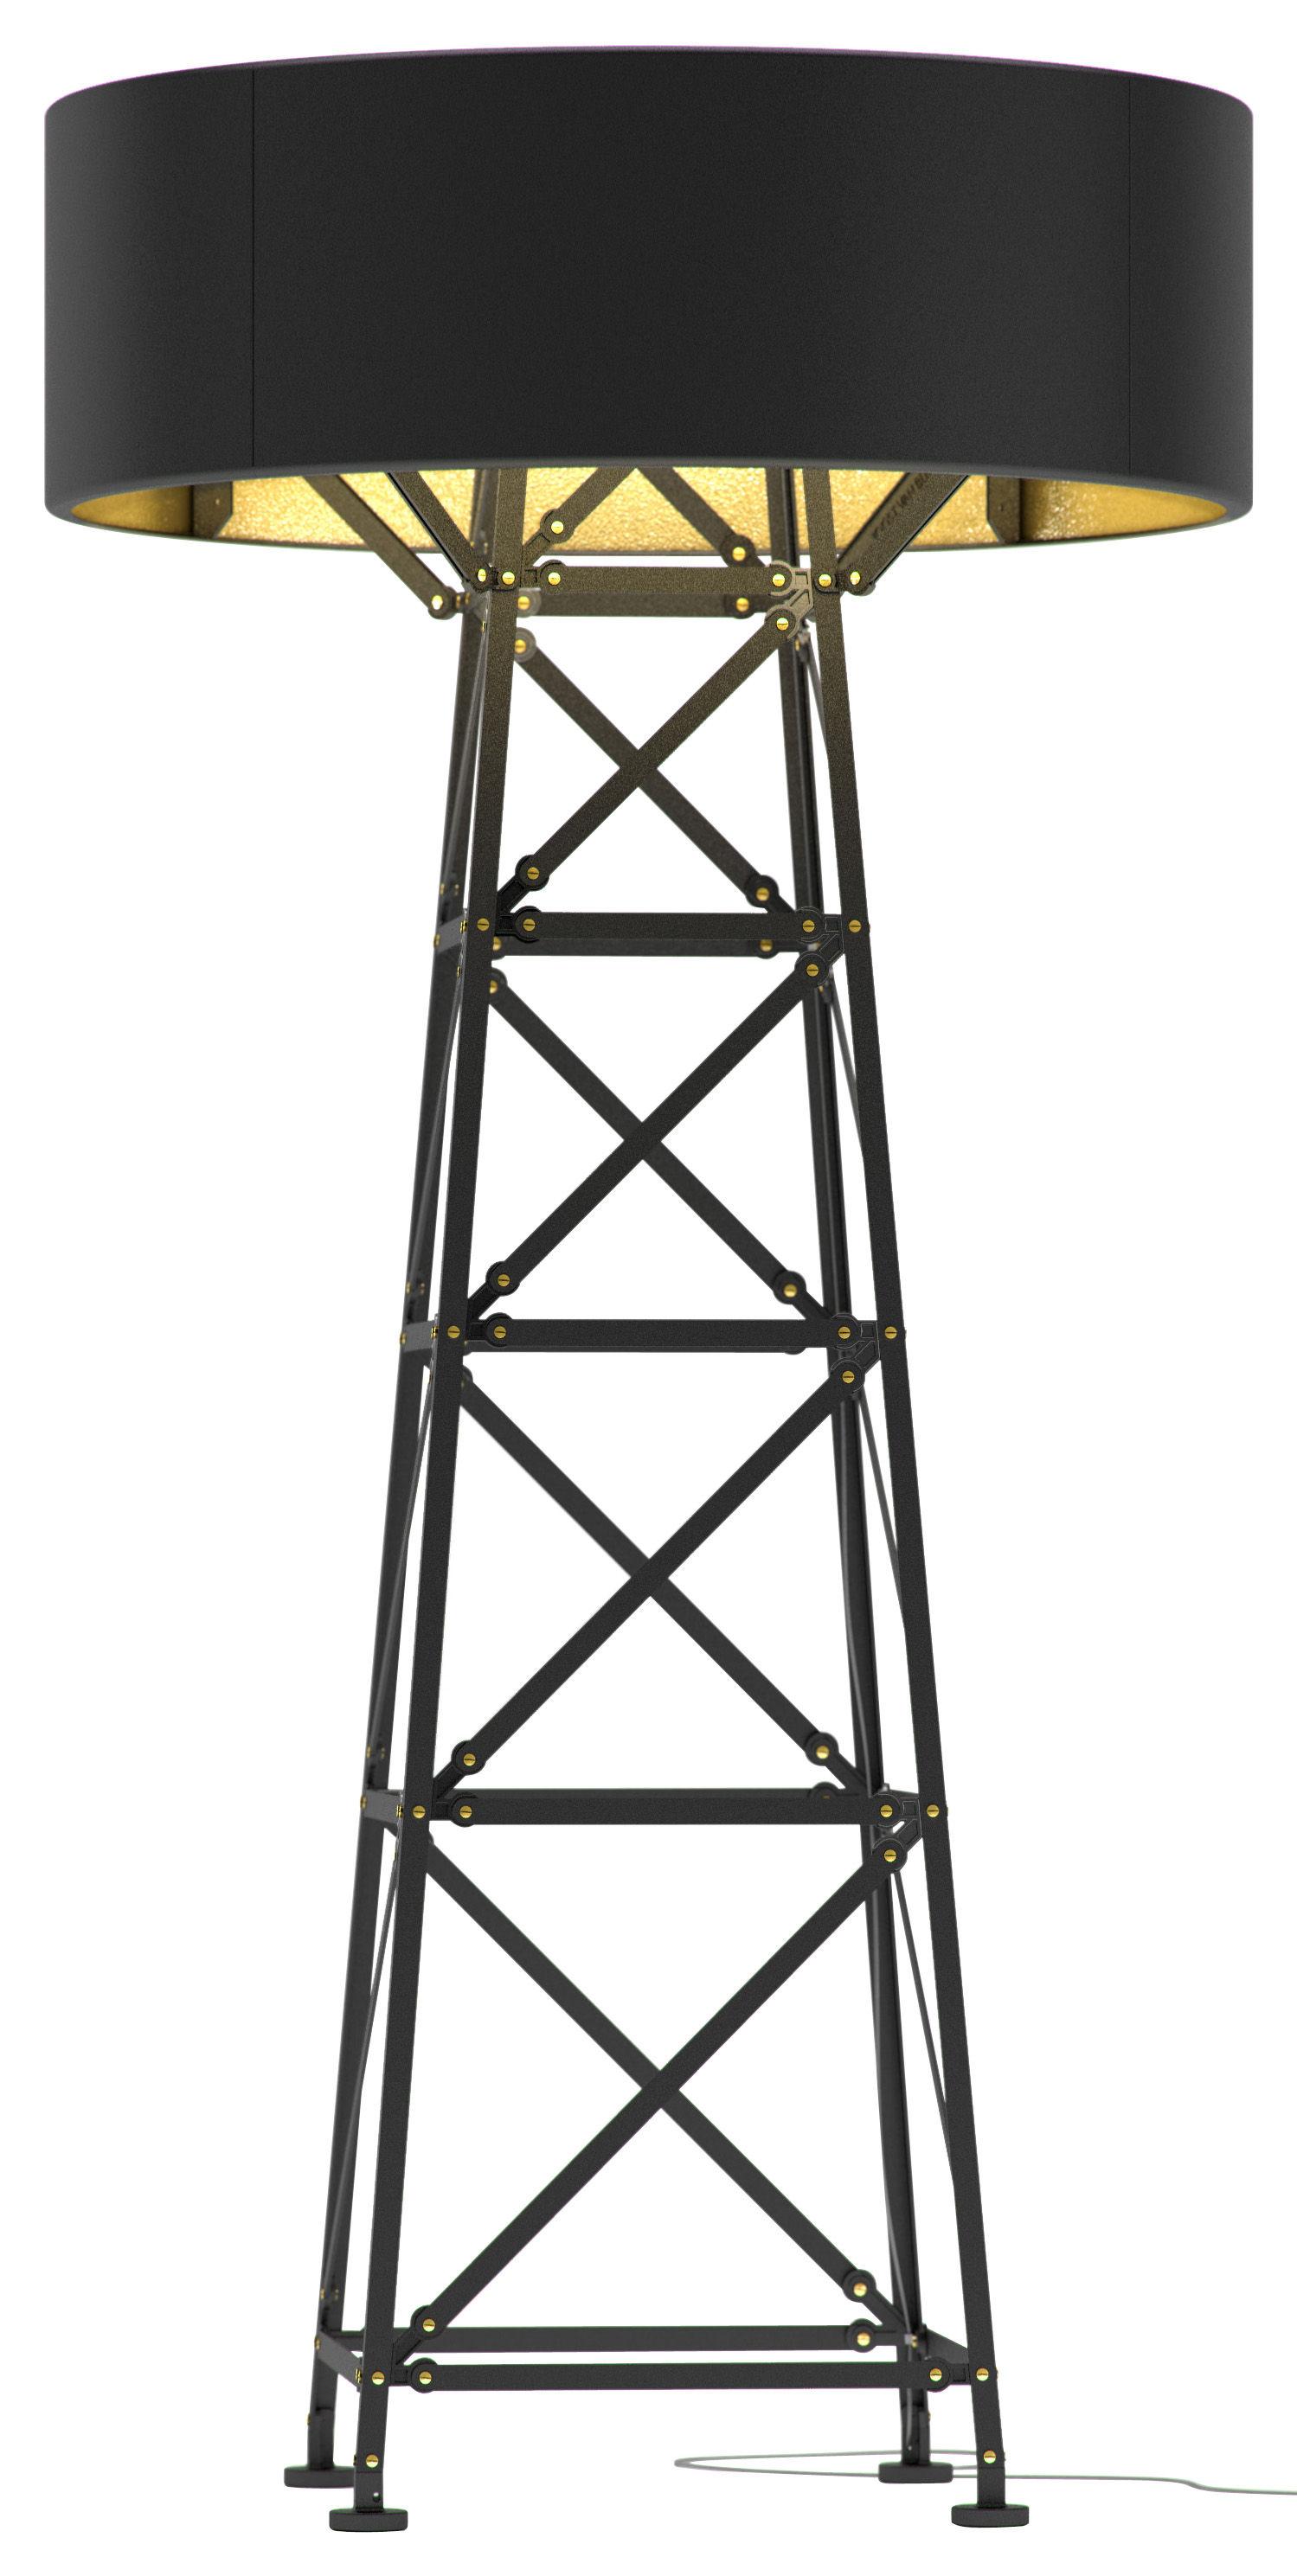 Luminaire - Lampadaires - Lampadaire Construction Lamp Large / H 185 cm - Moooi - Noir - Aluminium, Cuivre